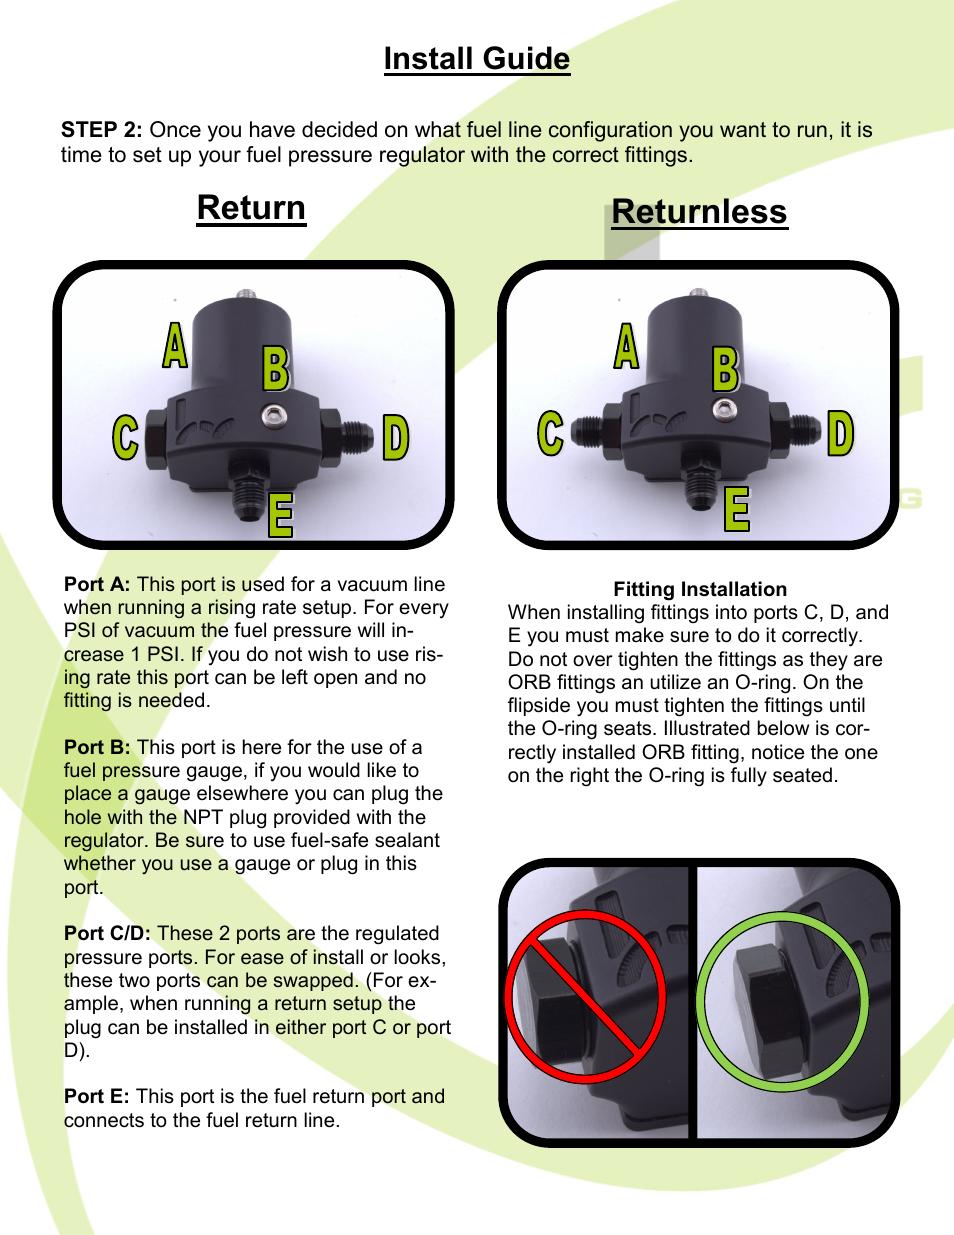 Return Returnless Install Guide Hybrid Racing Hr Unibody Fuel Pressure Regulator User Manual Page 4 7